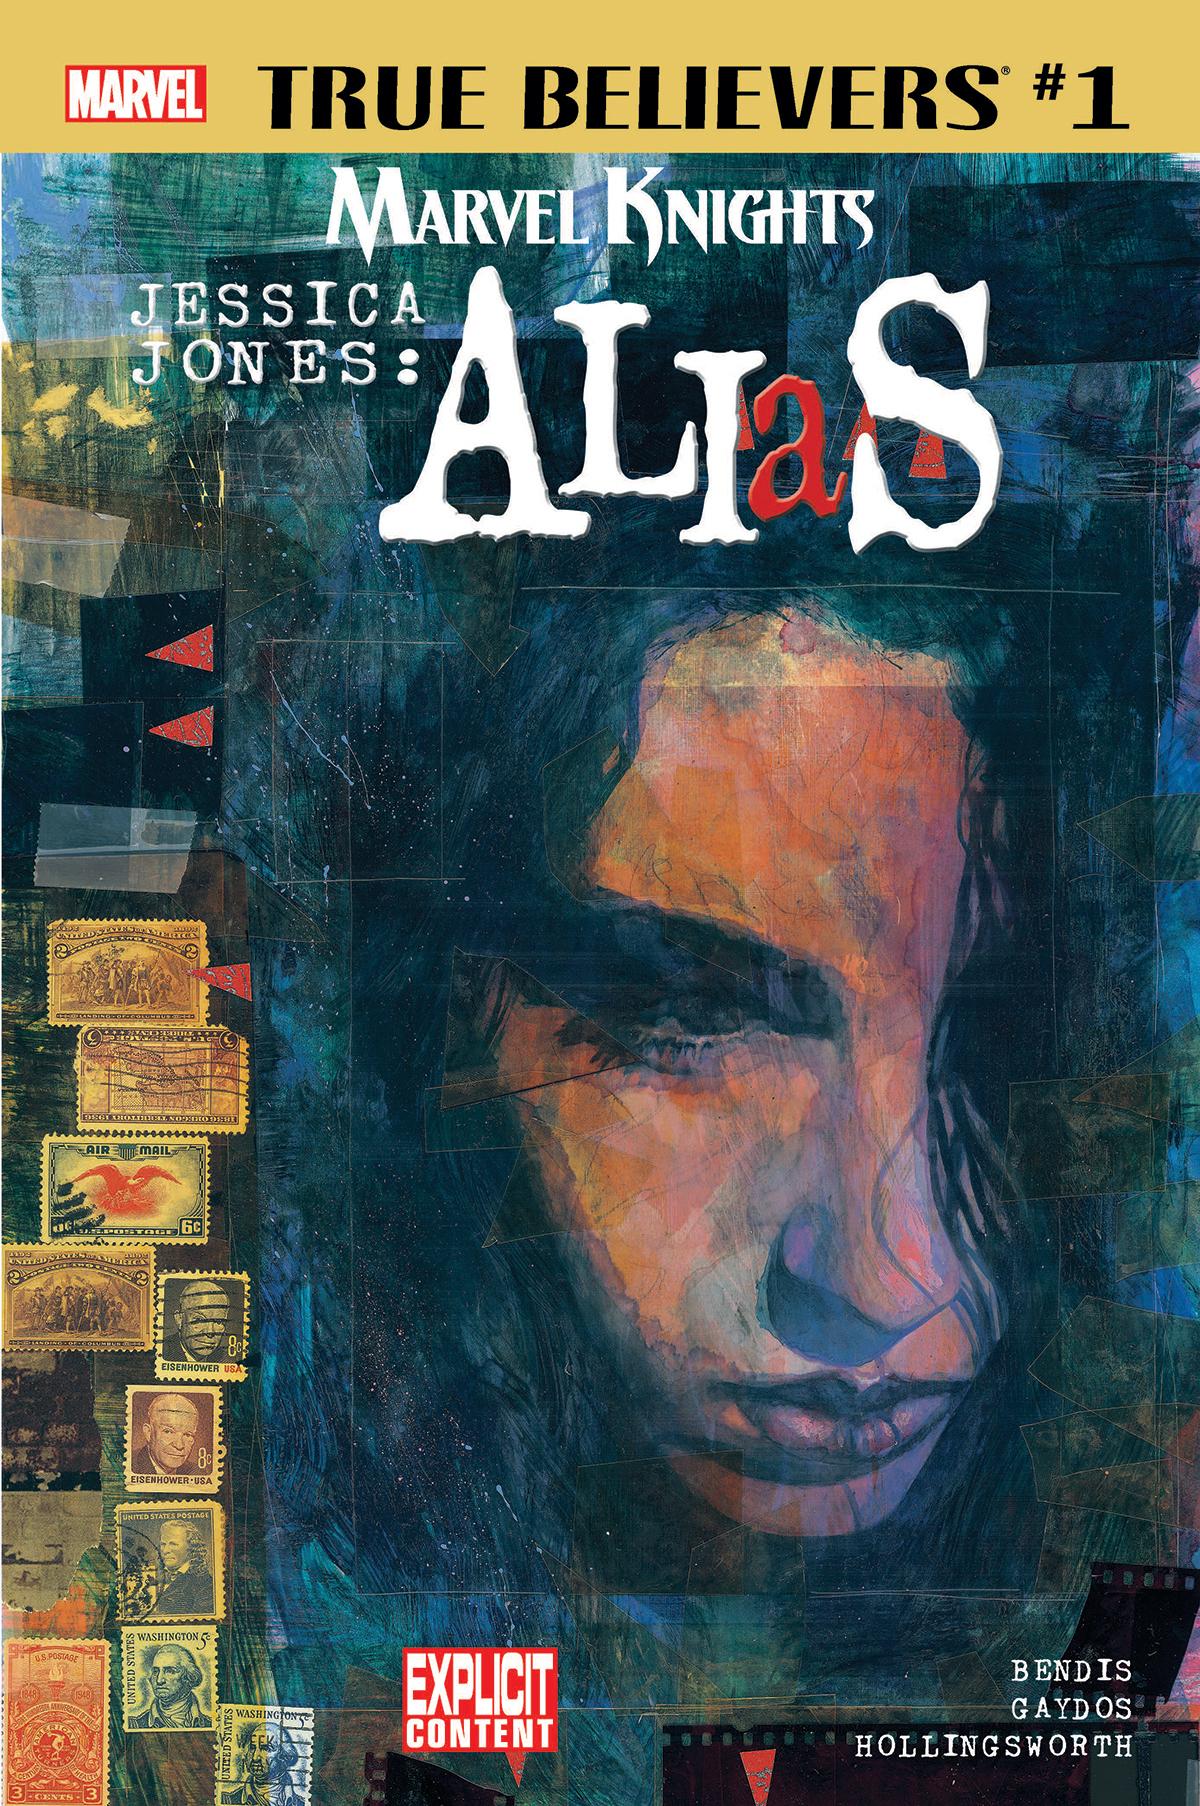 True Believers: Marvel Knights 20th Anniversary - Jessica Jones: Alias by Bendis & Gaydos Vol 1 1